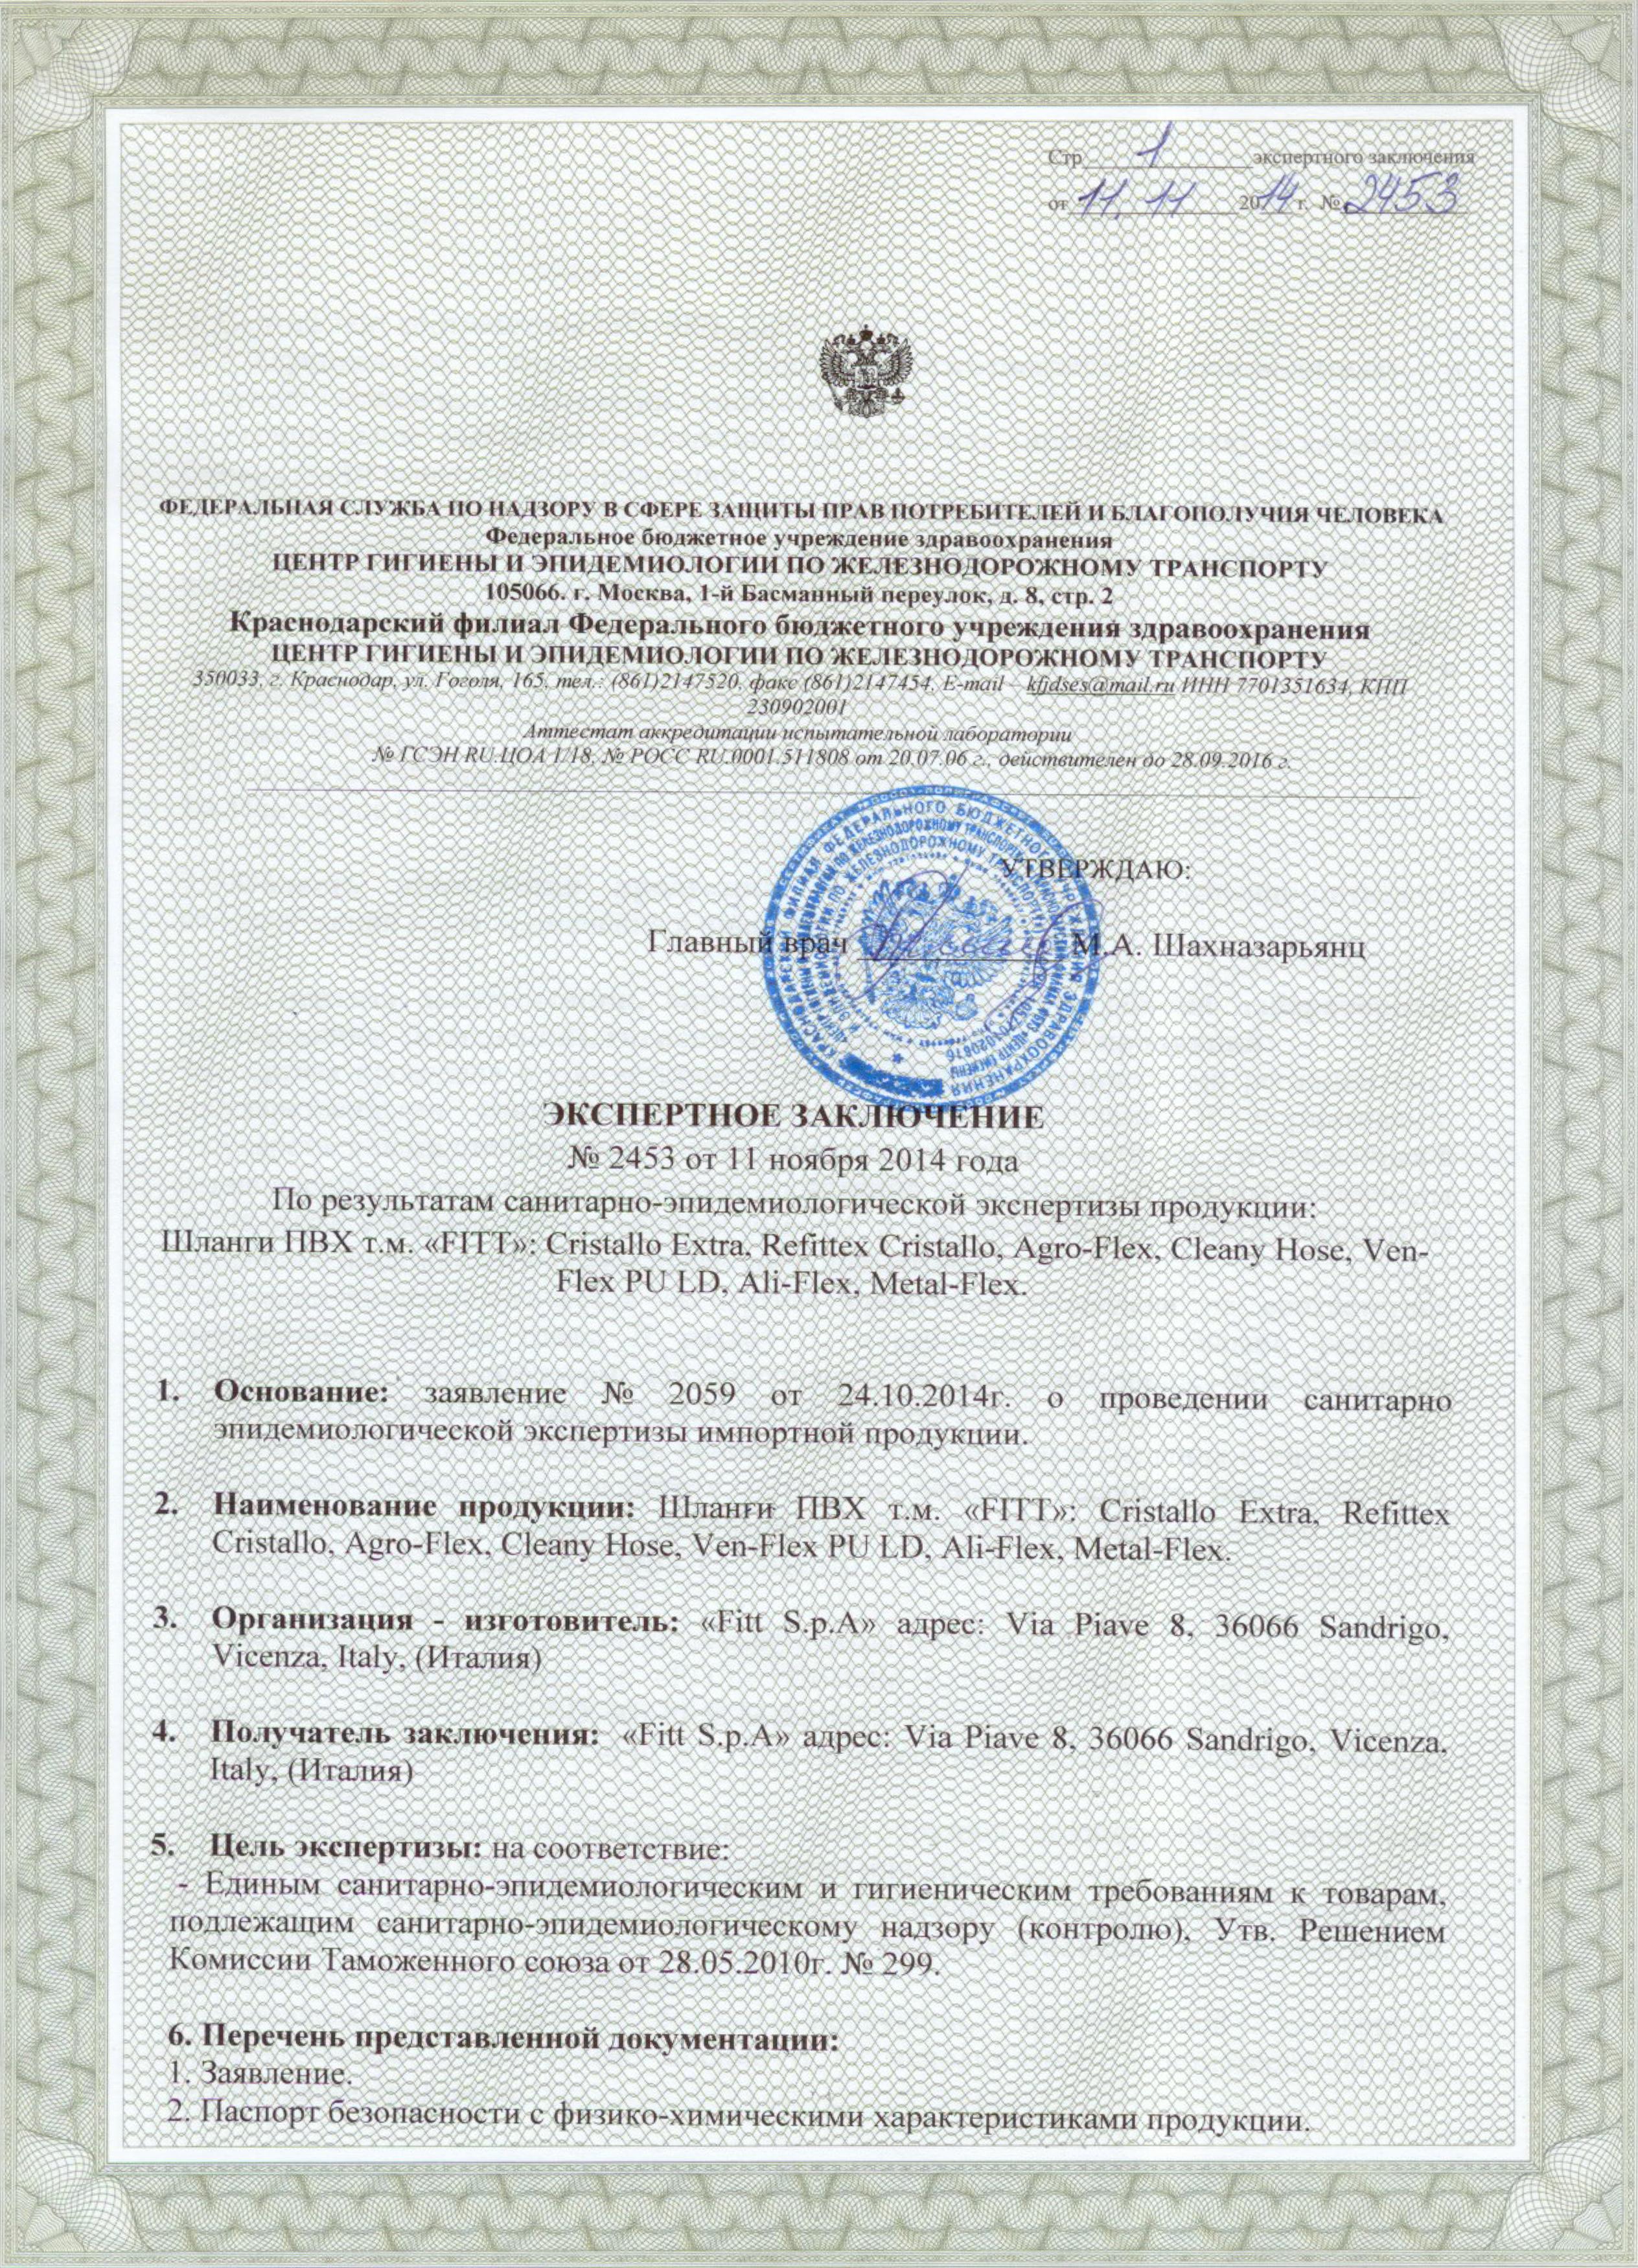 State_registration_Certificate_-_Russia-1.jpg